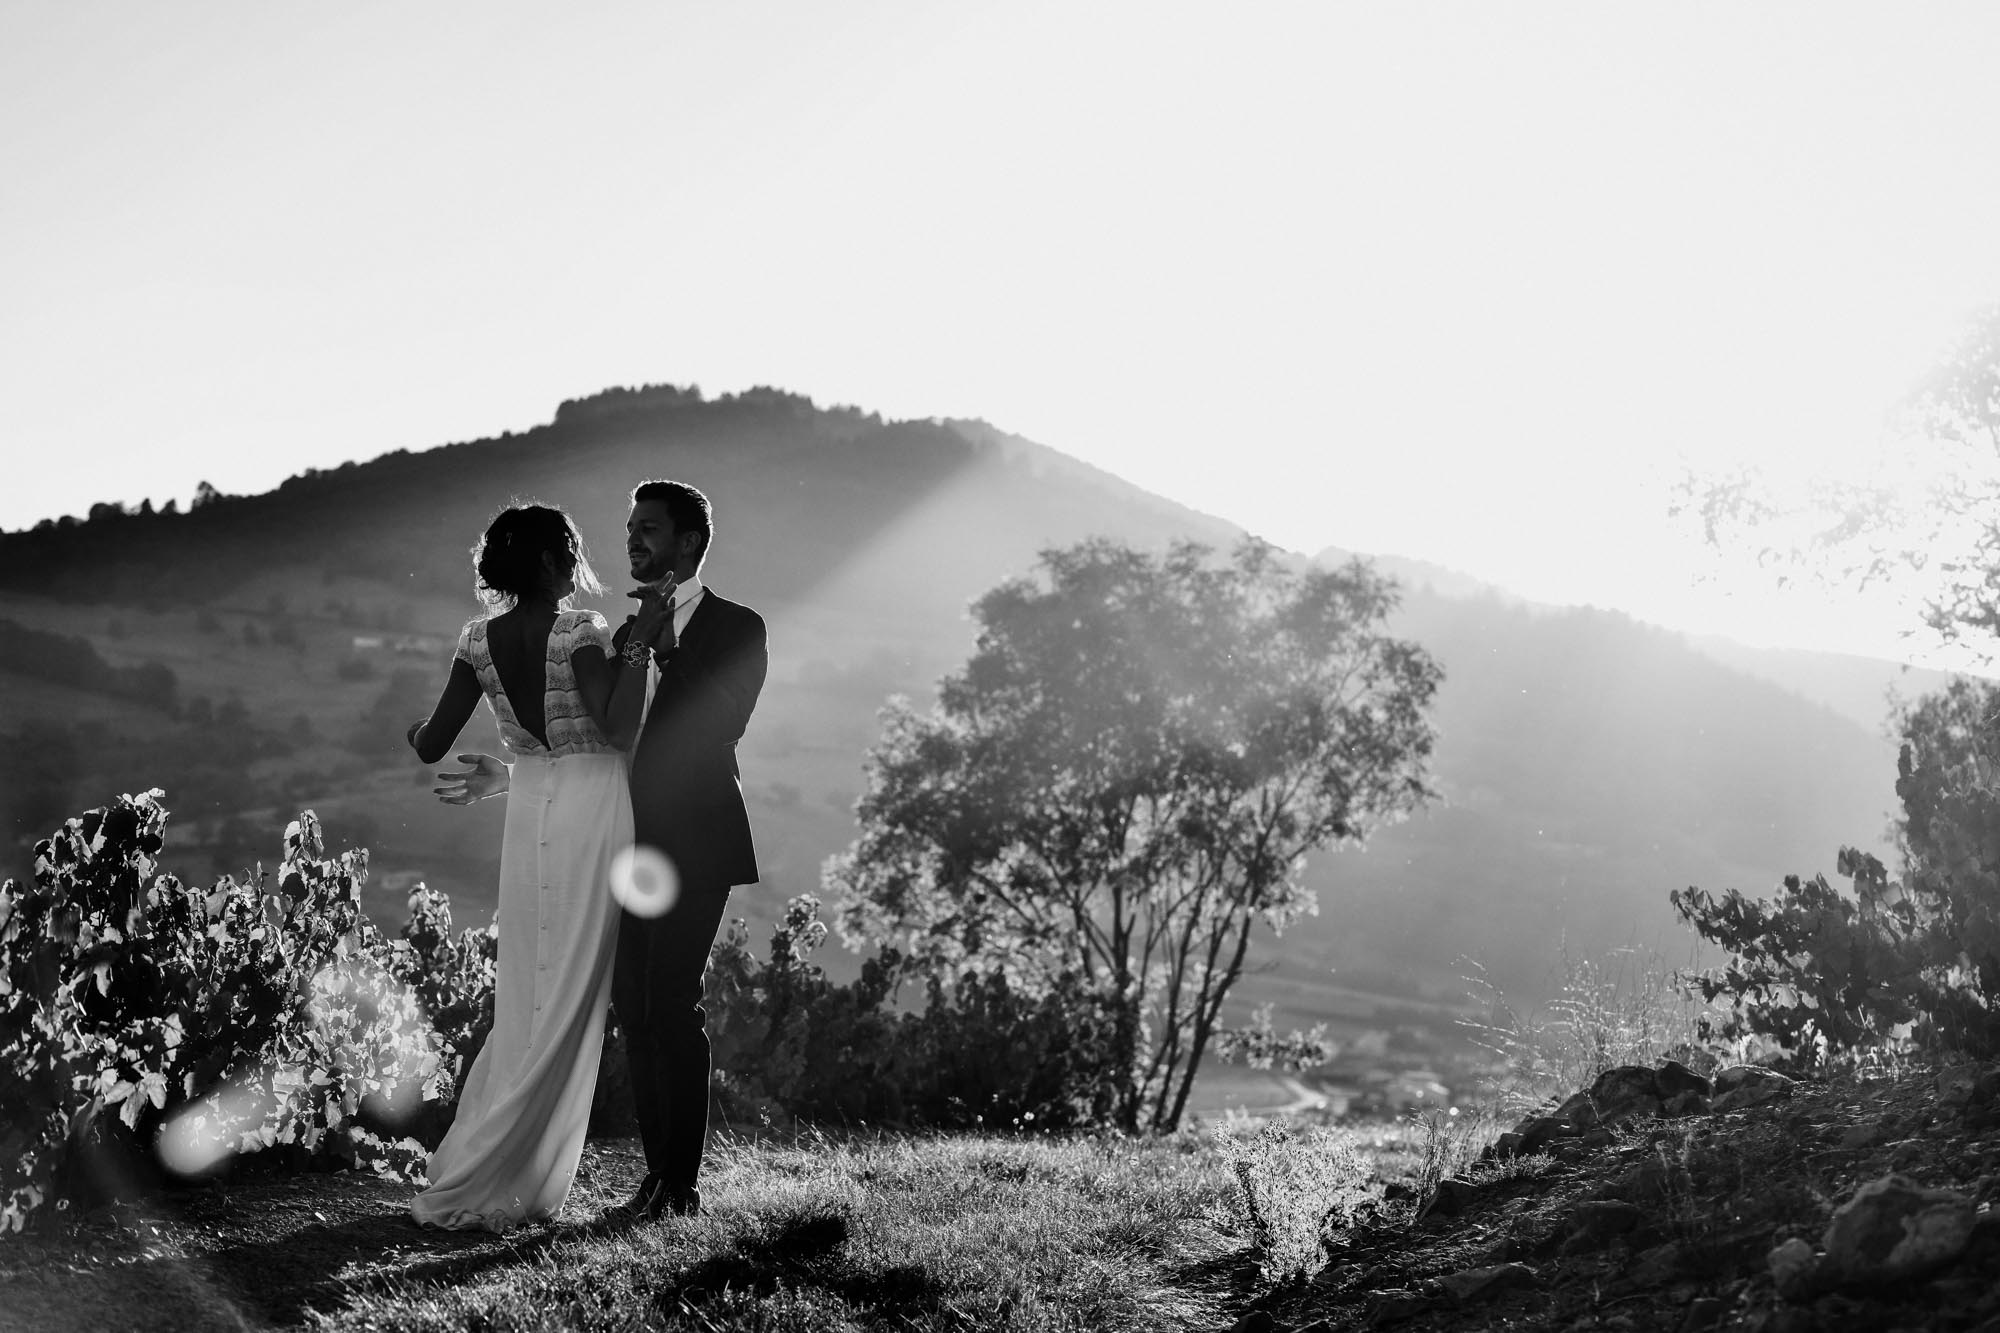 2018-09-08 - LD8_6146 - photographe mariage lyon - laurie diaz - www.lauriediazweeding.com.jpg